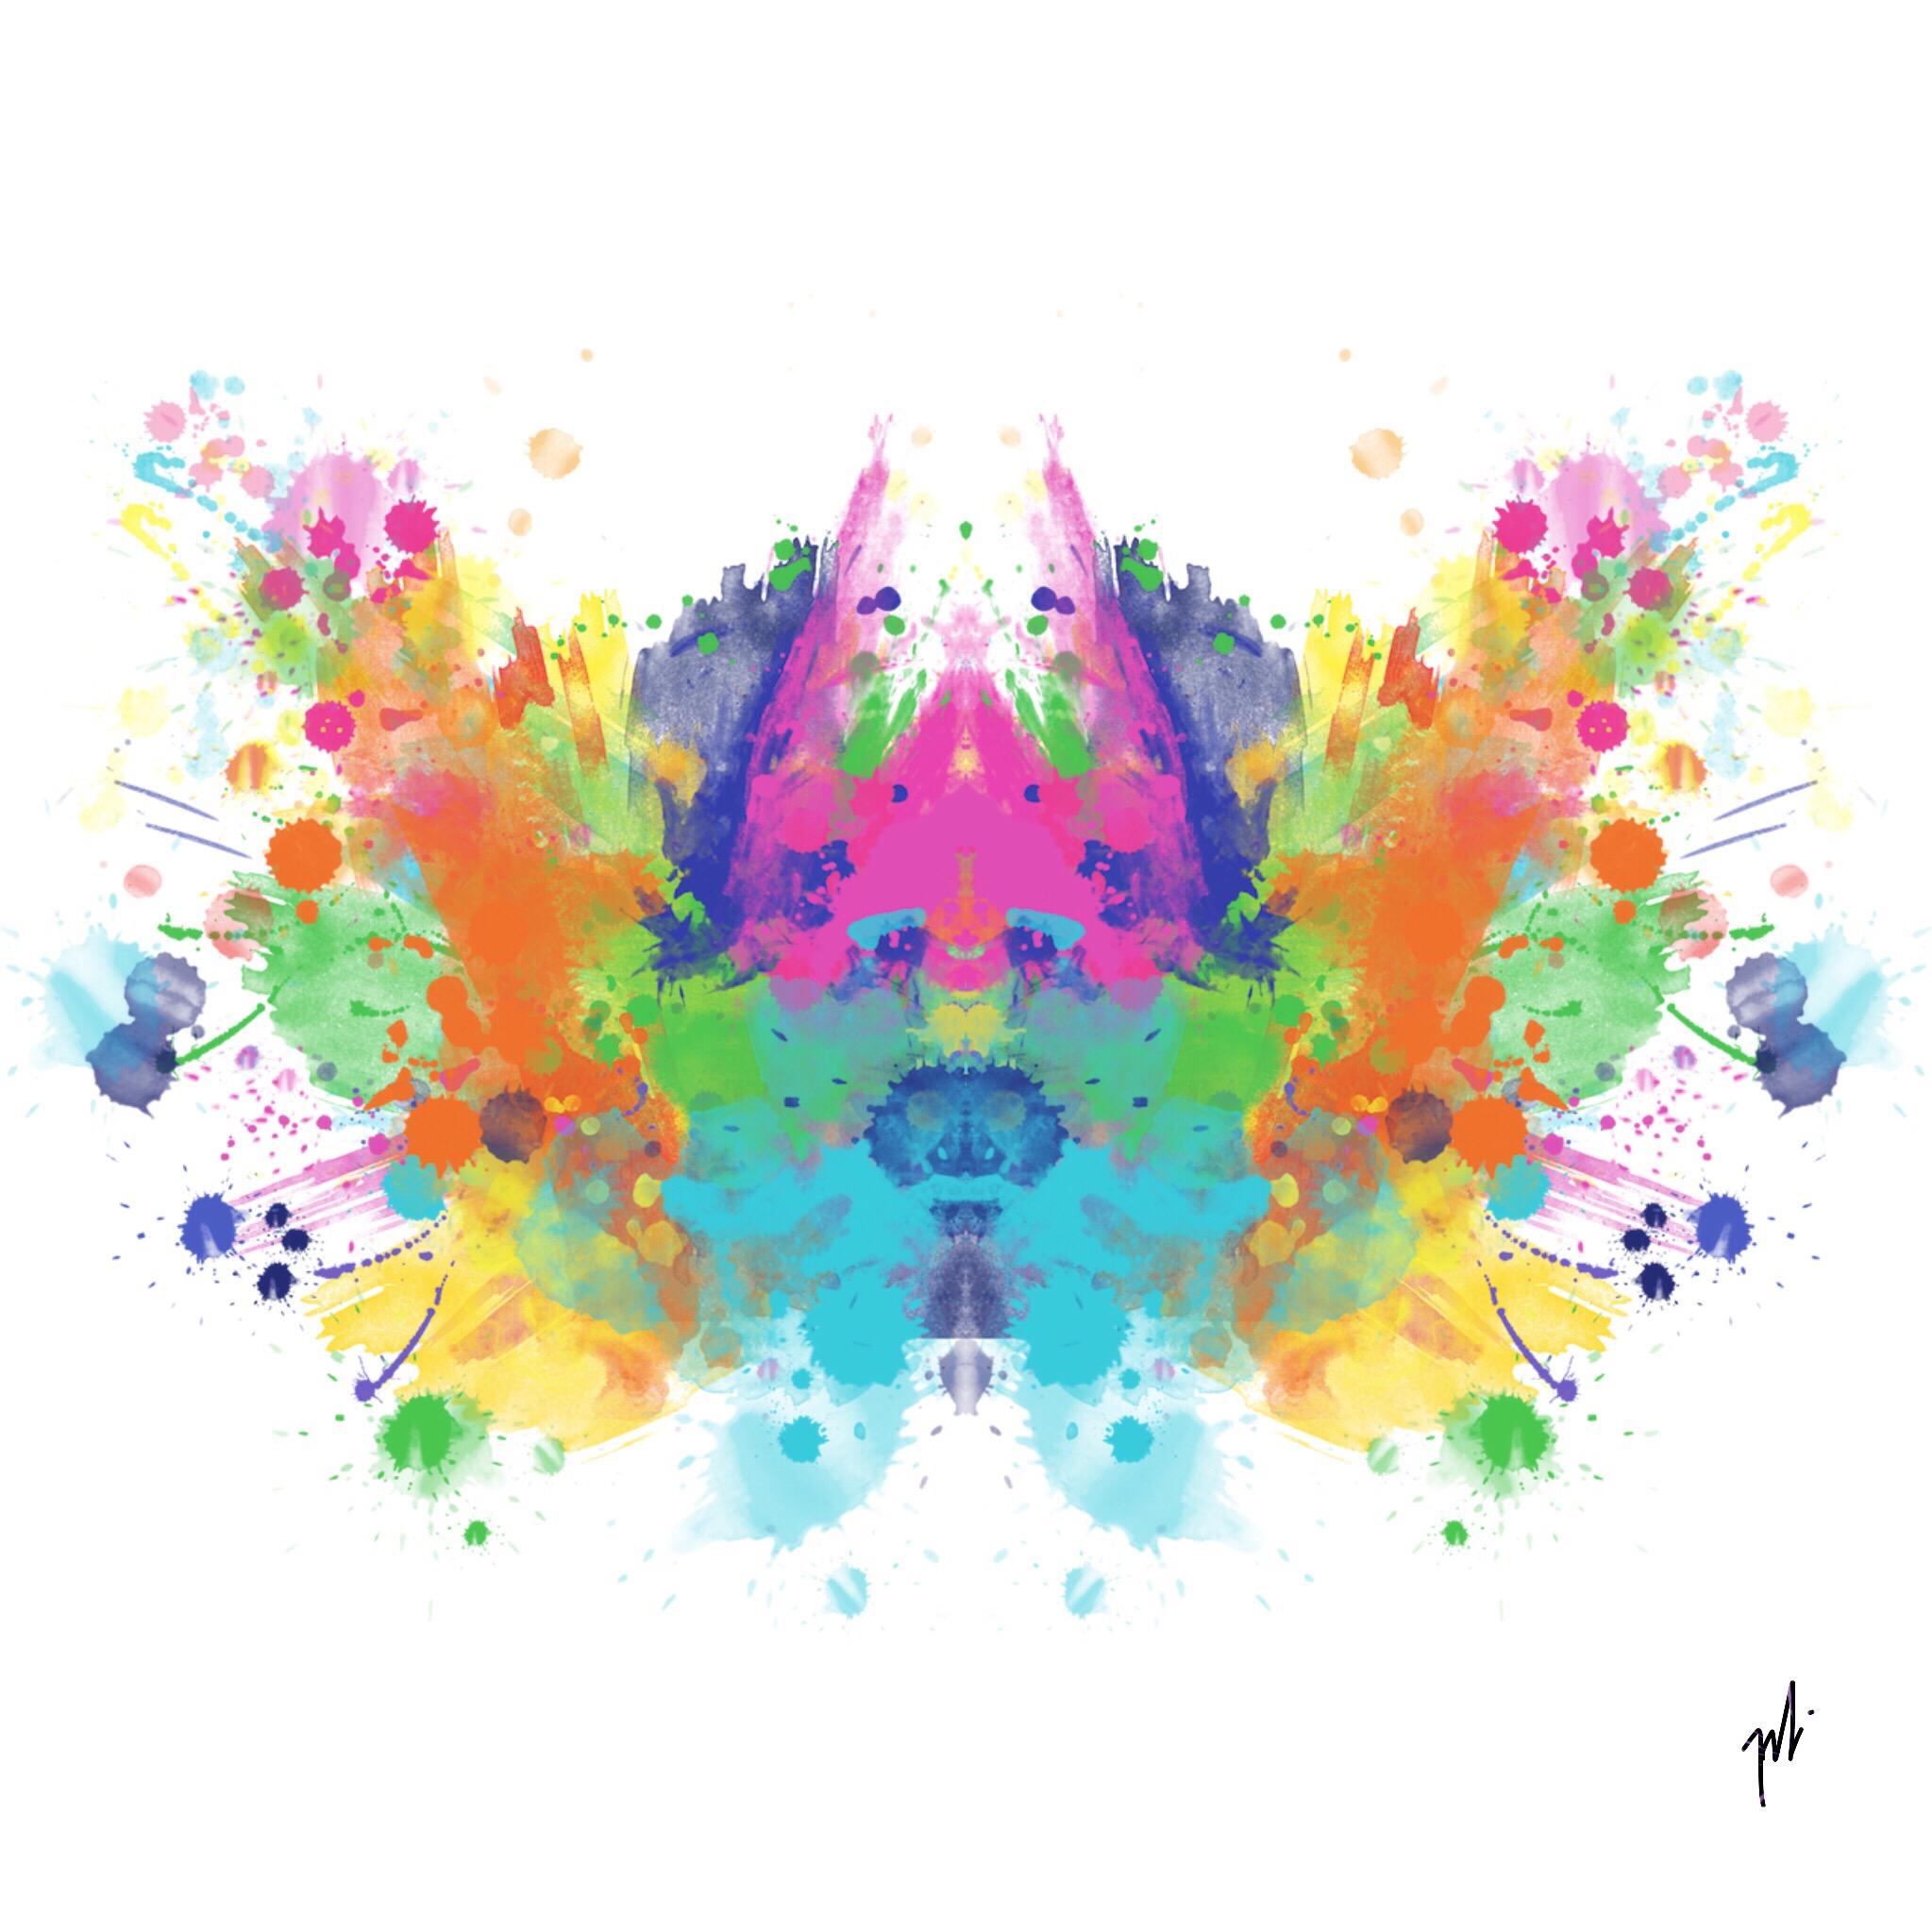 #splashofcolor #rorschach #madewithpicsart